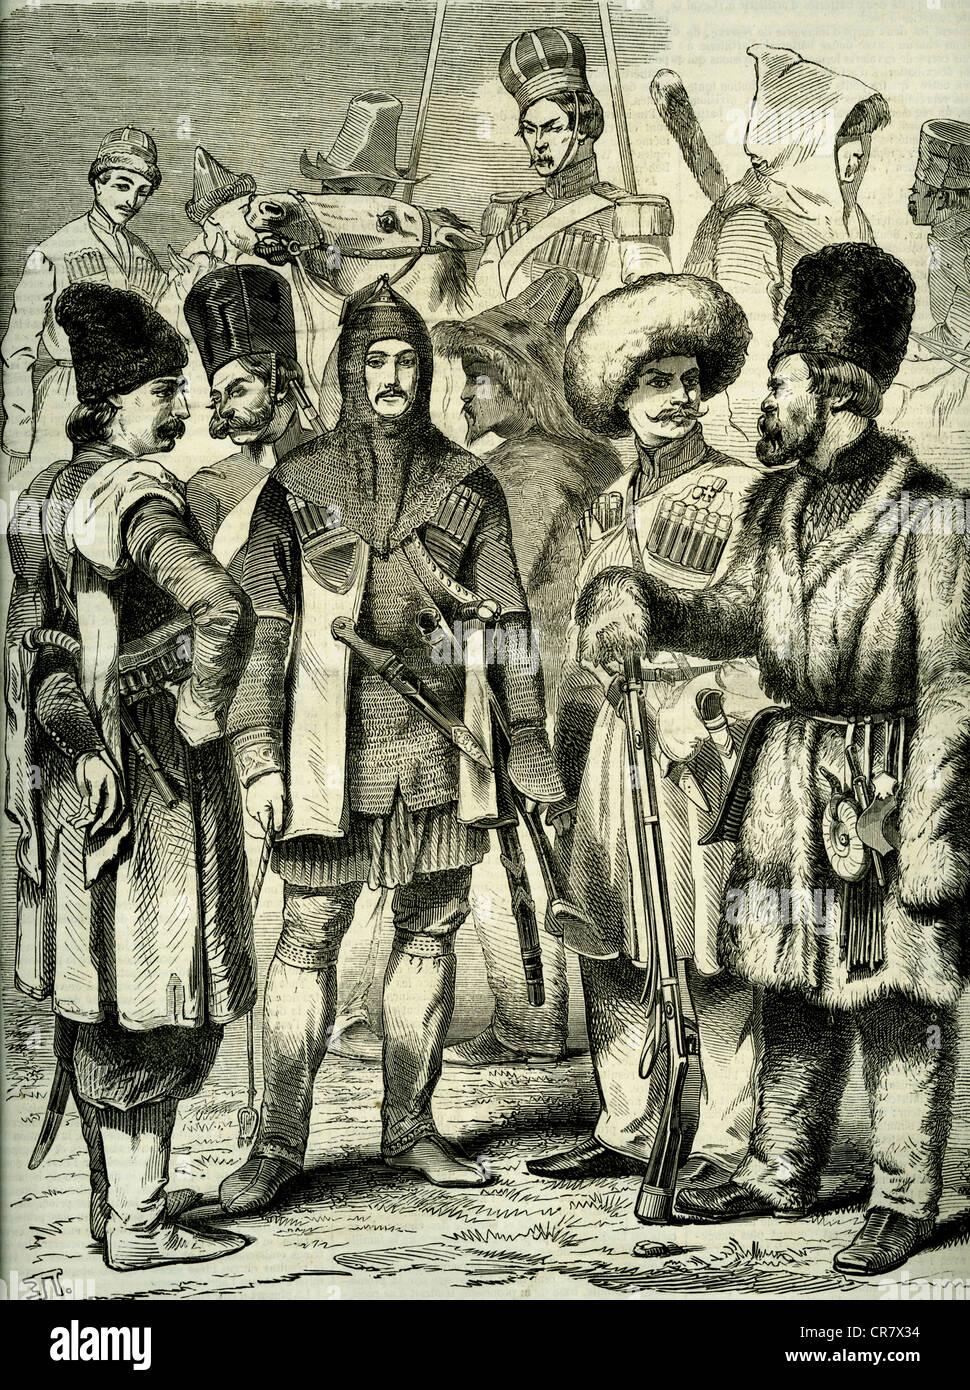 Irregular Russian Army, civilians, Russia, historical illustration, 1909 - Stock Image